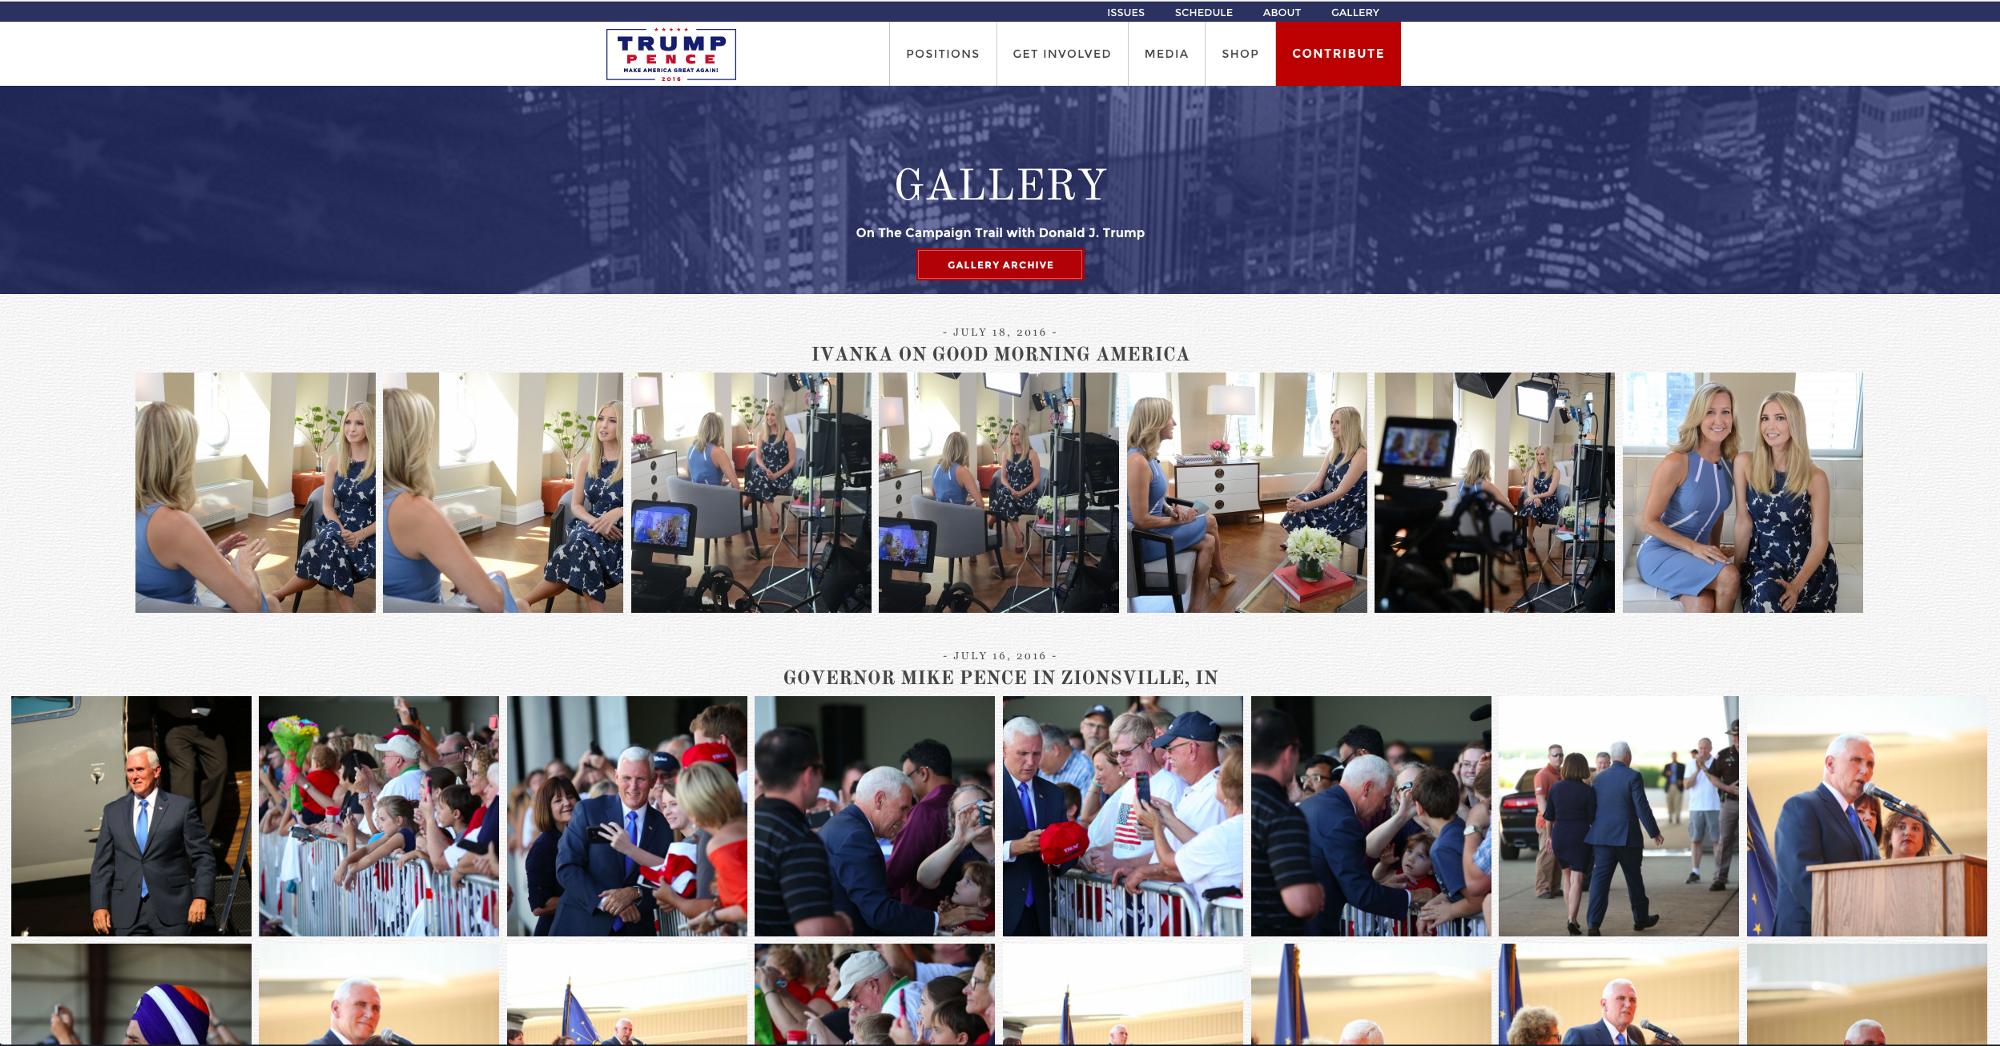 donald trump photo page